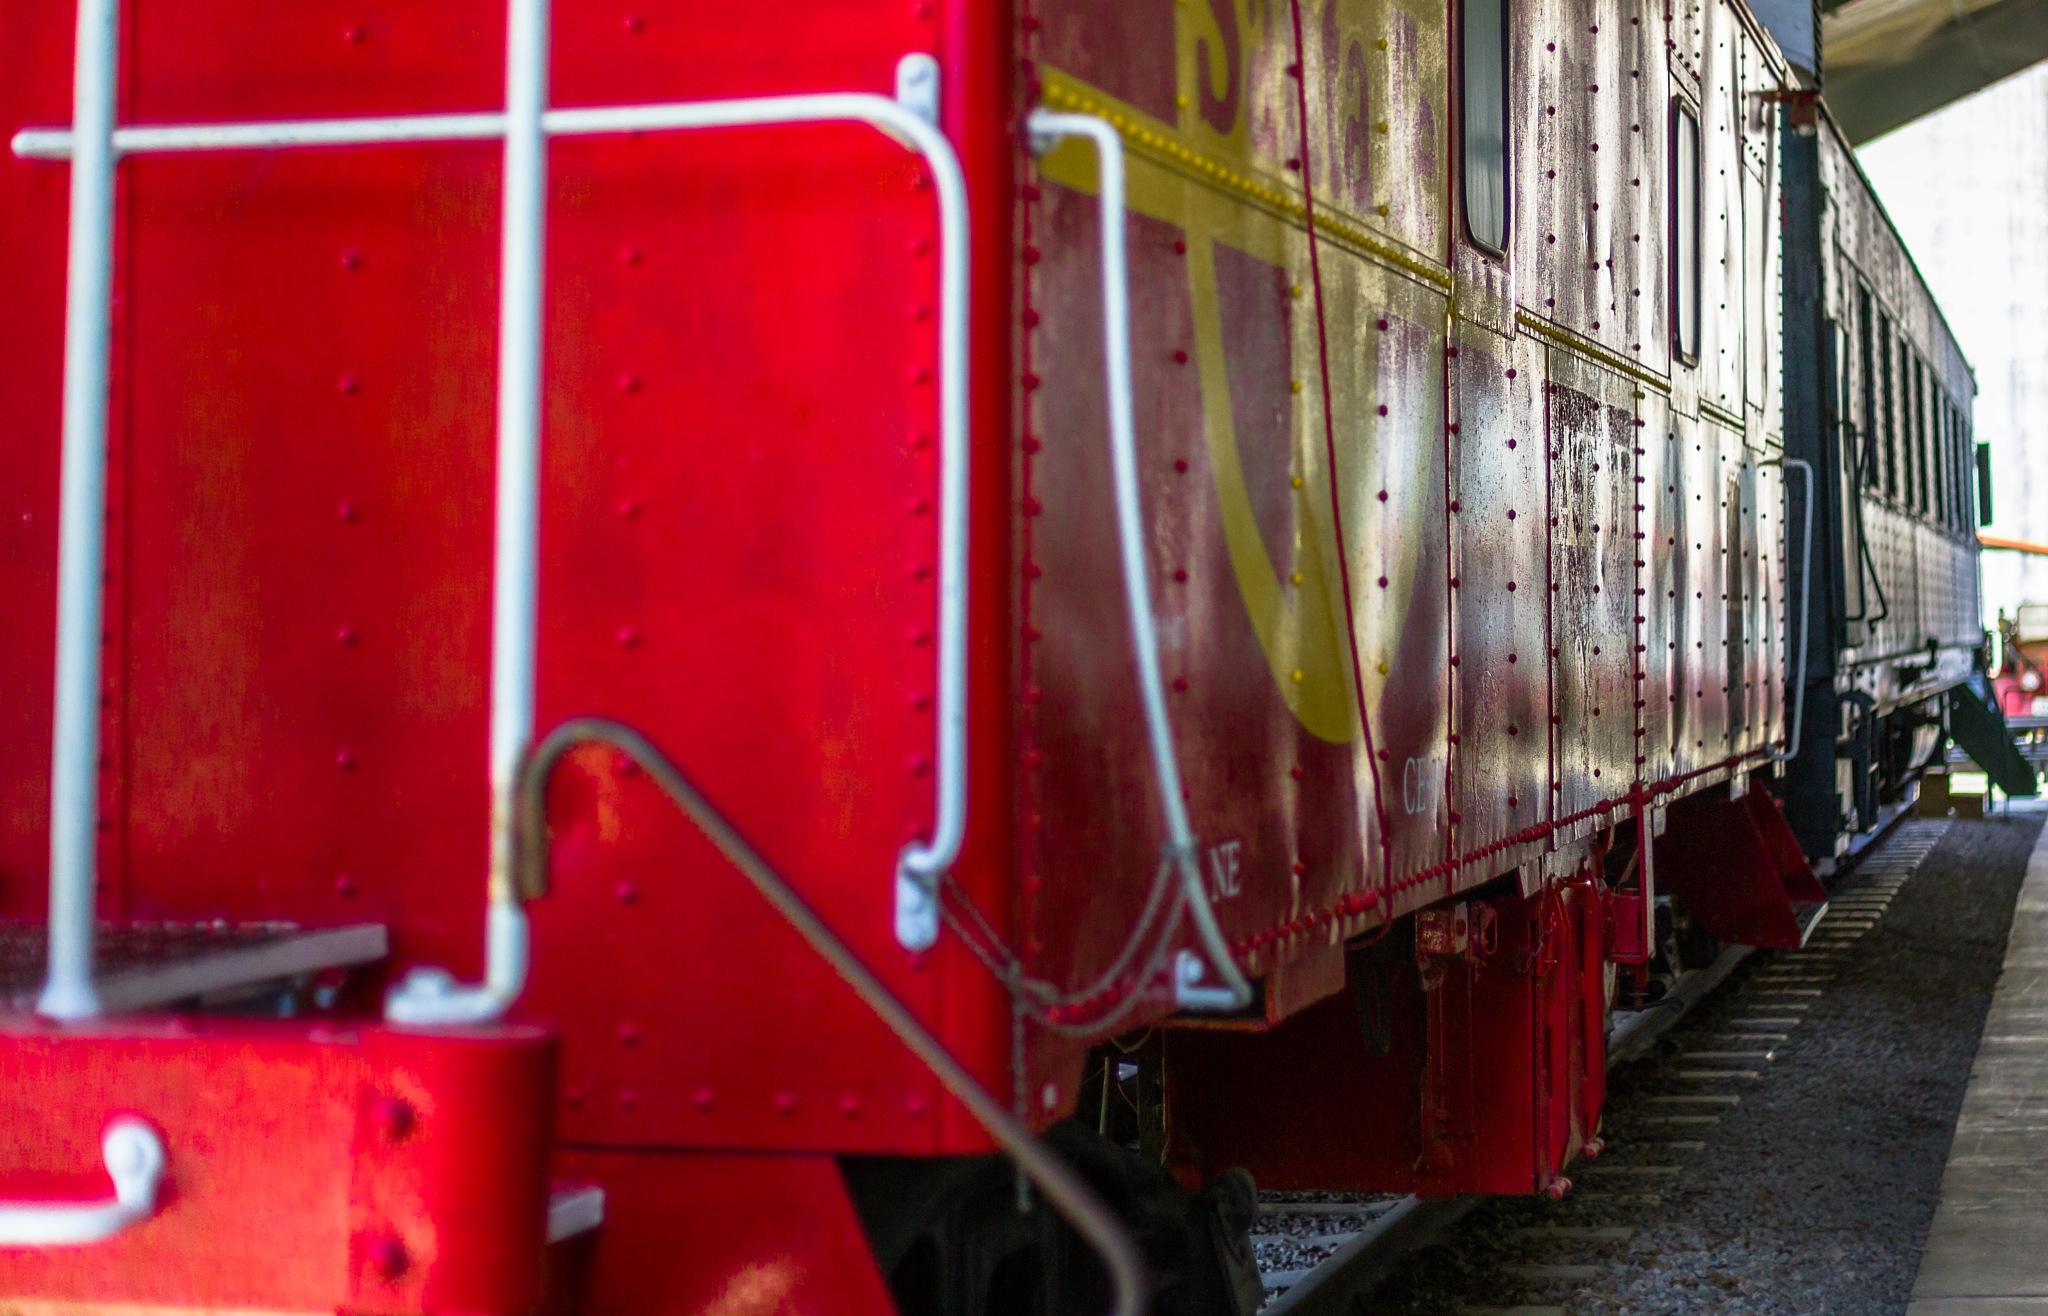 Red Passenger Car by Lane L Gibson